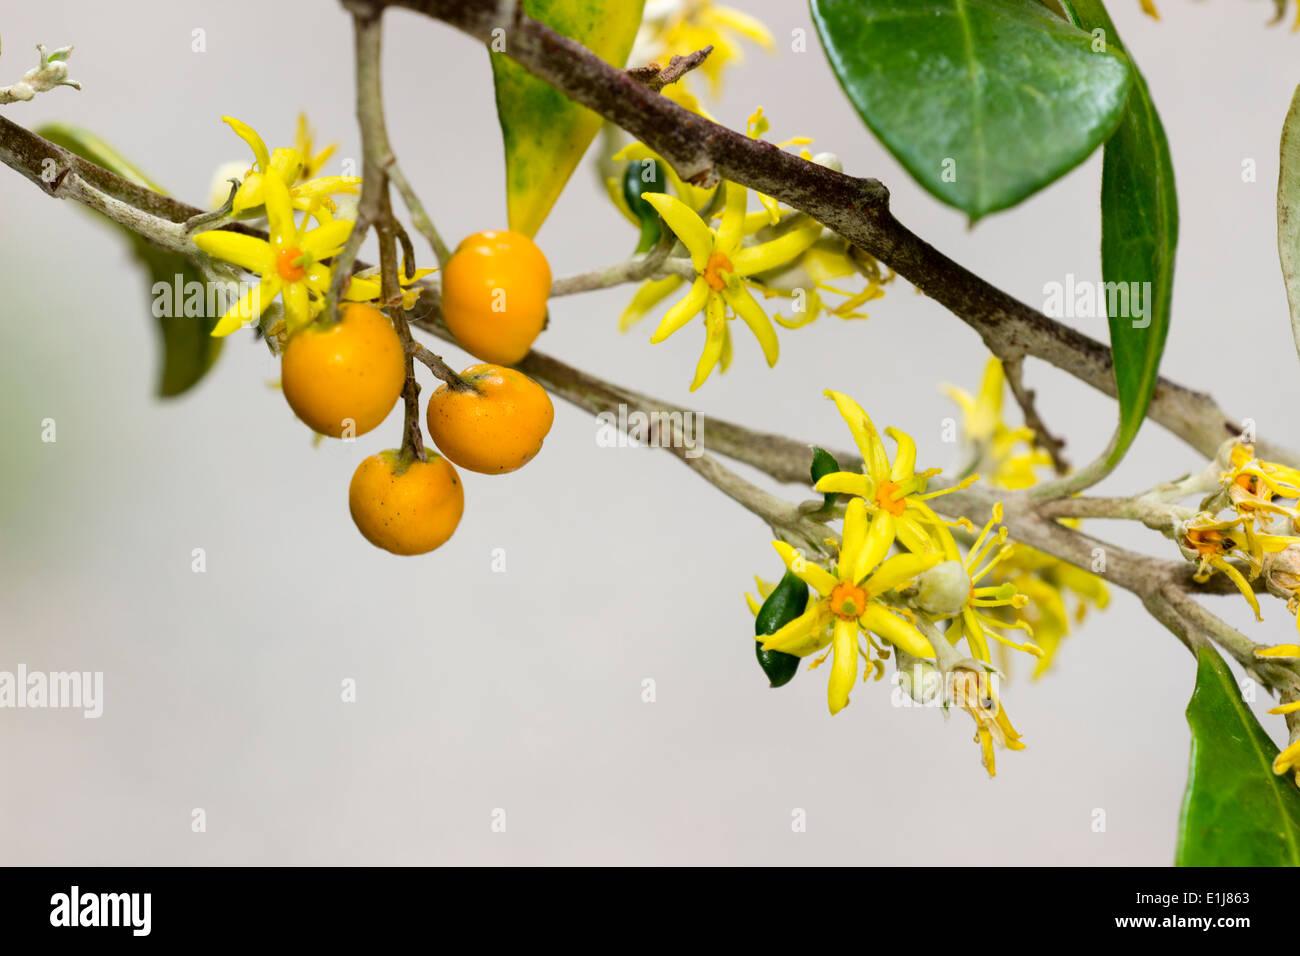 Small yellow flowers and orange berries of the new zealand native small yellow flowers and orange berries of the new zealand native corokia virgata mightylinksfo